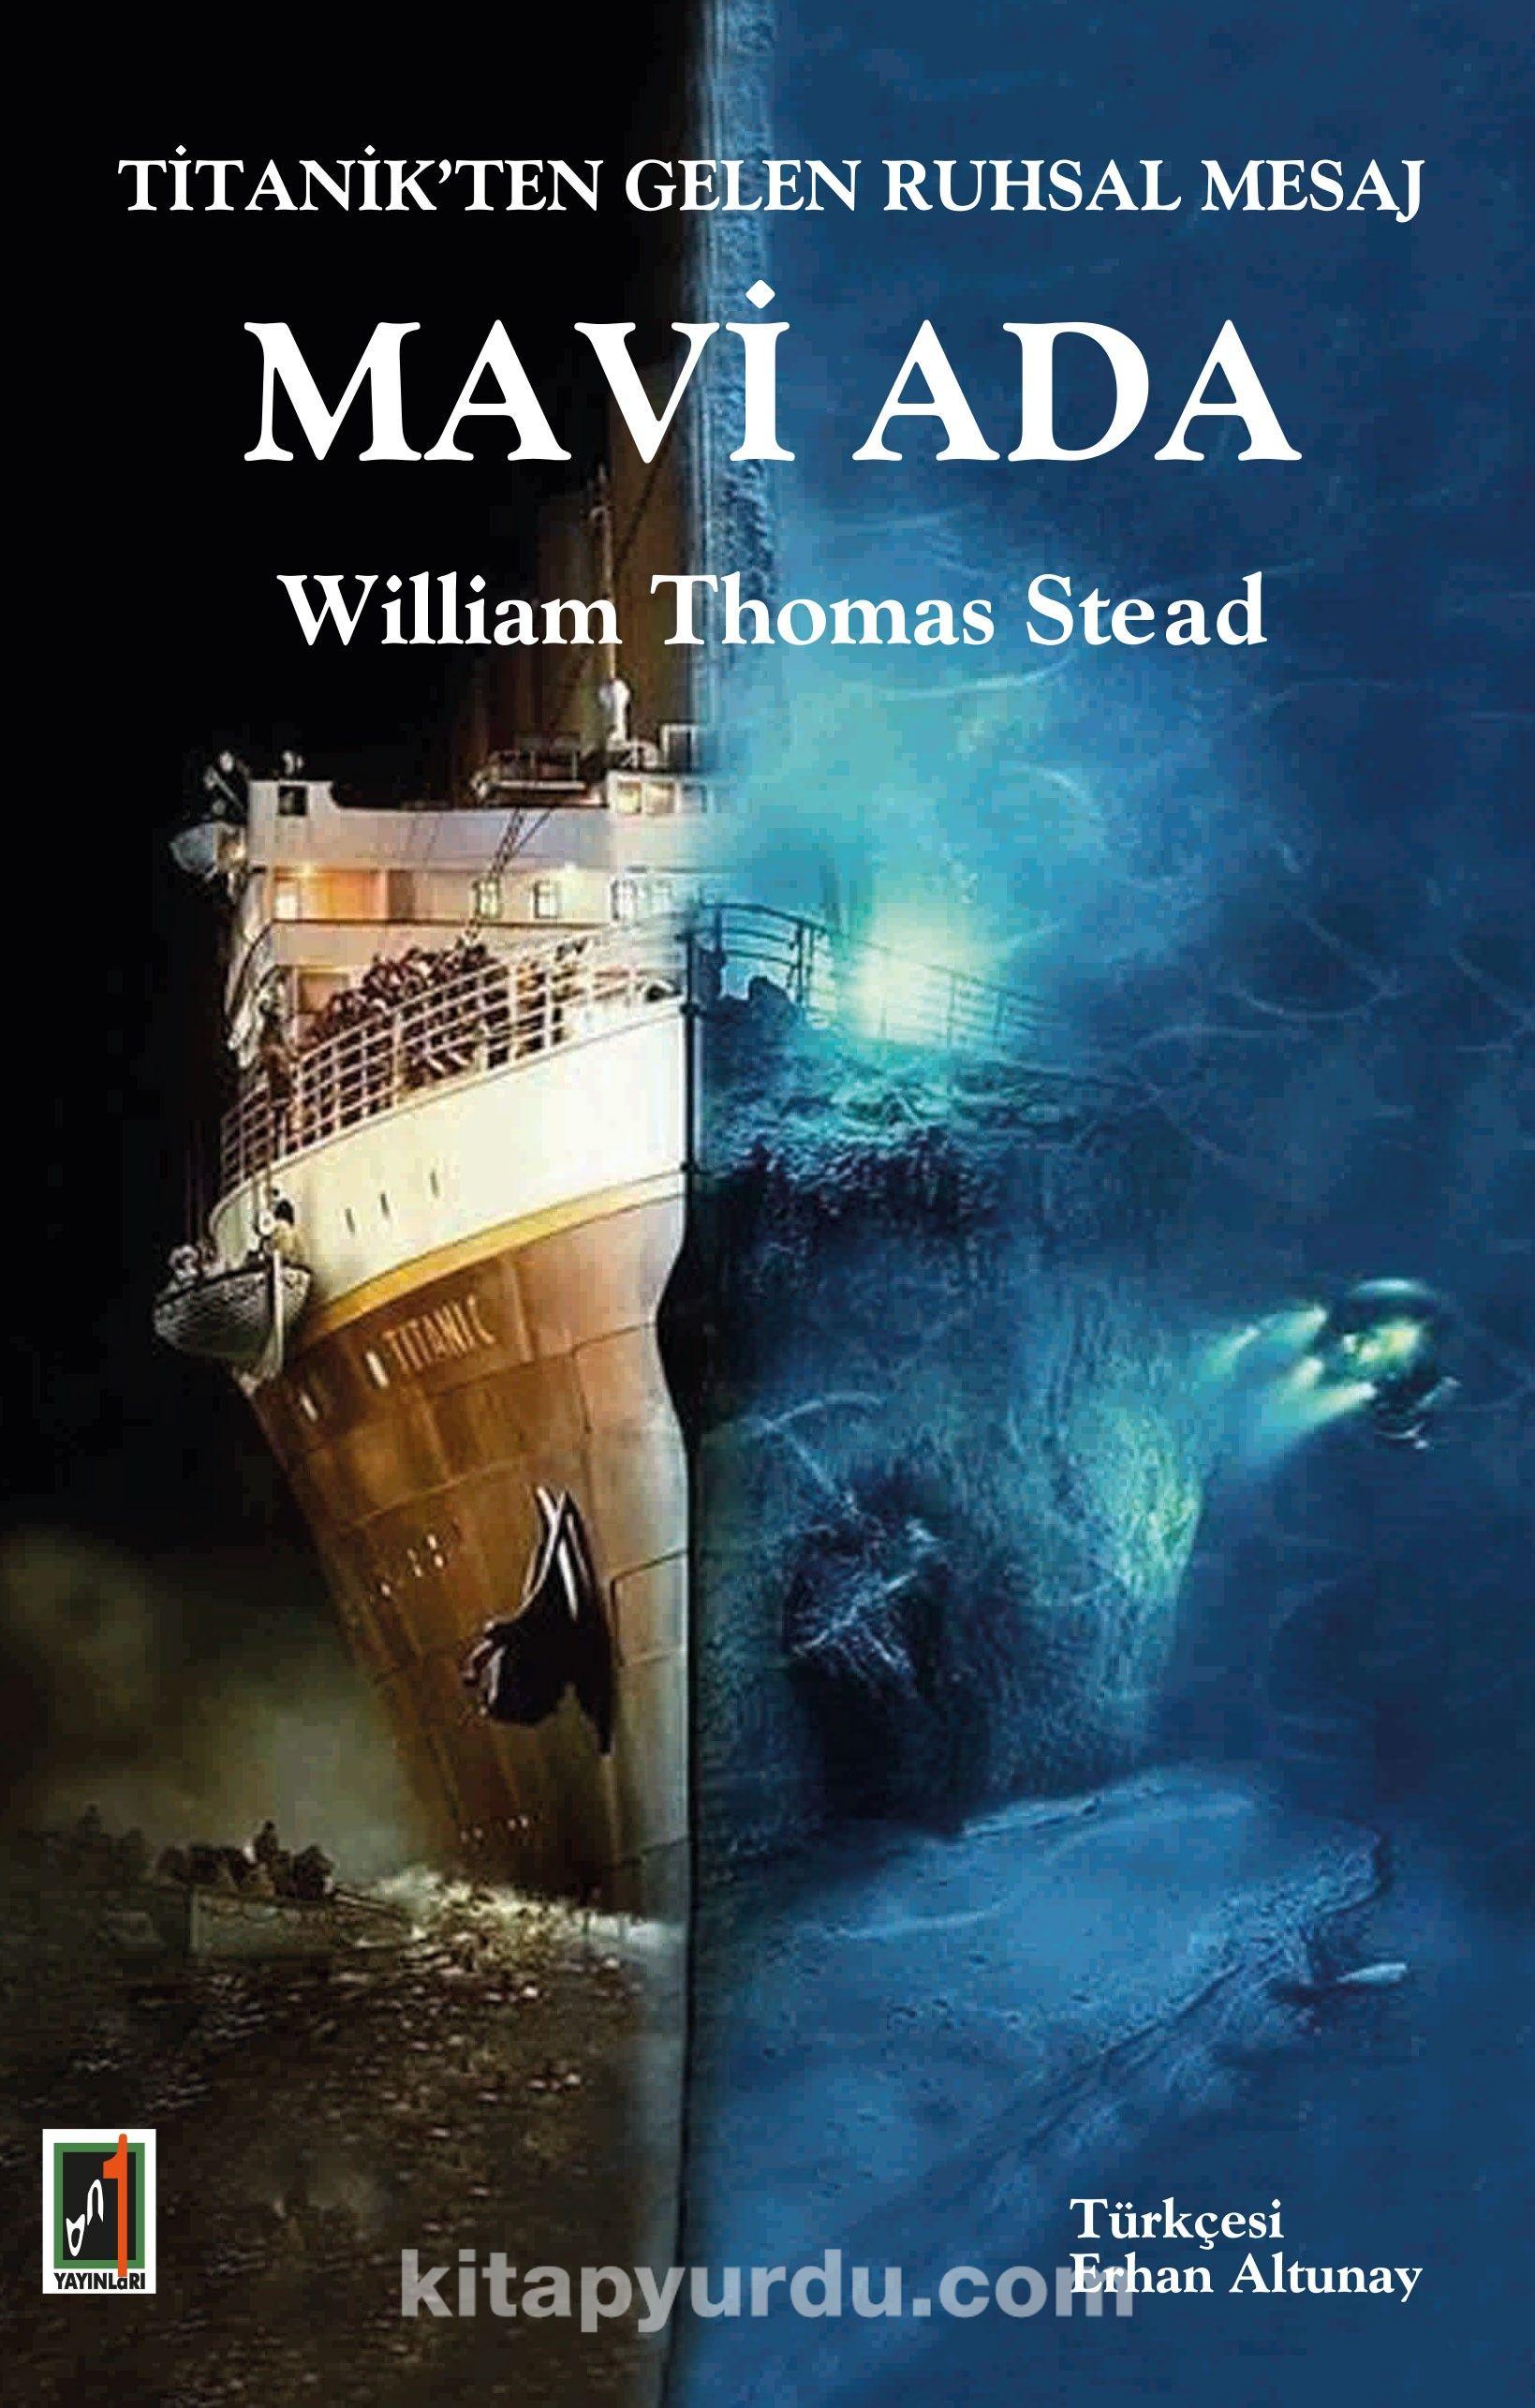 Titanik'ten Gelen Ruhsal Mesaj Mavi Ada - William Thomas Stead pdf epub